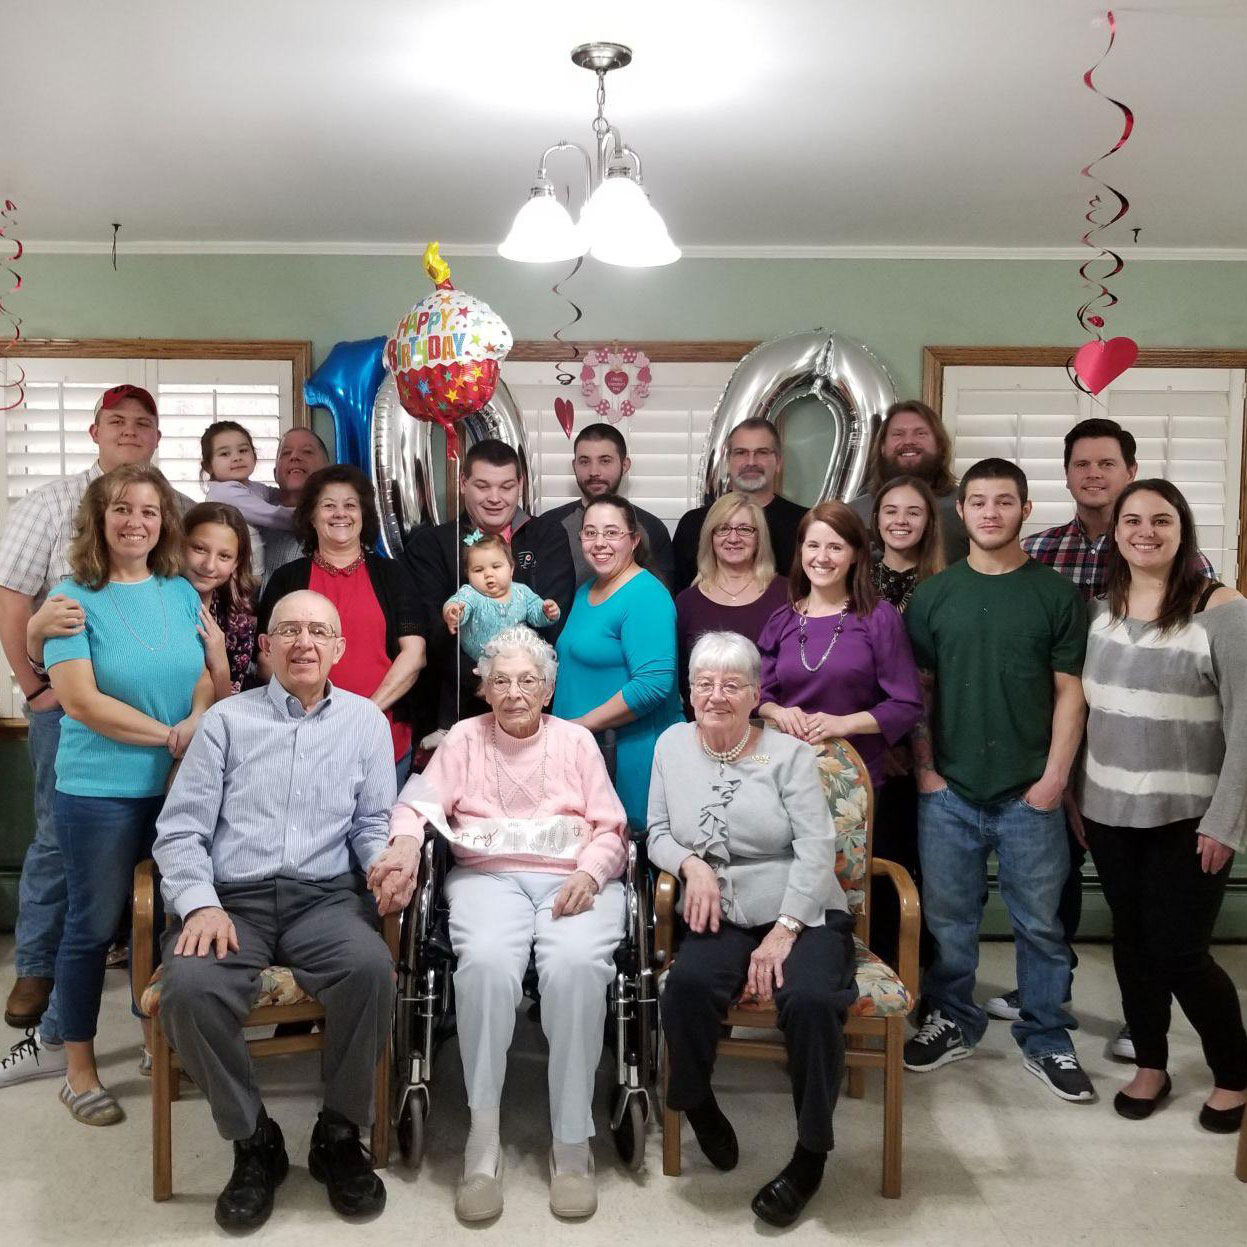 Image of 100th Birthday Party at Kadima at Pottstown Nursing and Rehabilitation Facility